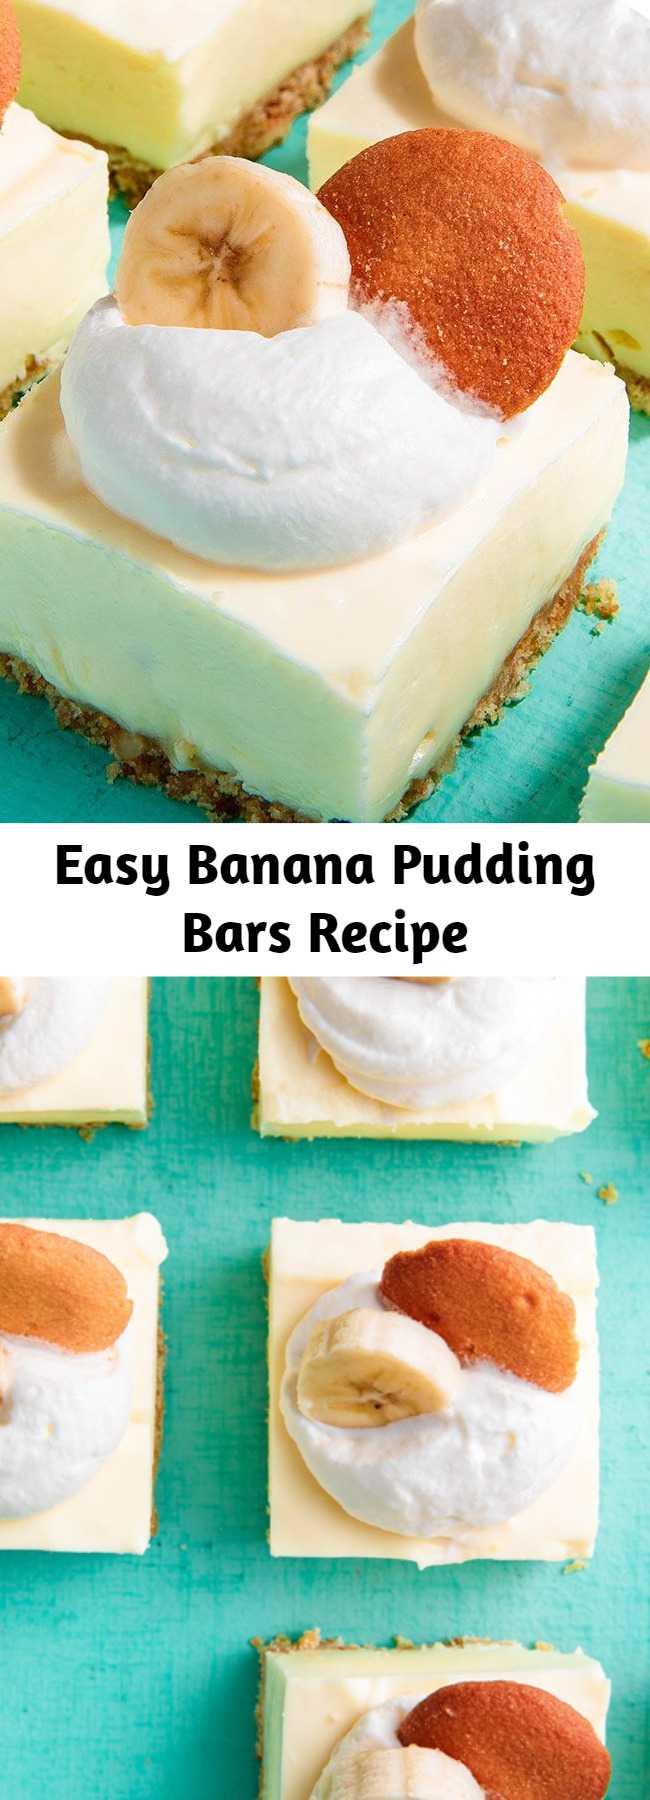 Easy Banana Pudding Bars Recipe - Good luck just having one of these Banana Pudding Cheesecake Bars #banana #cheesecake #dessert #nobake #recipe #dessert #easyrecipe #bananapudding #pudding